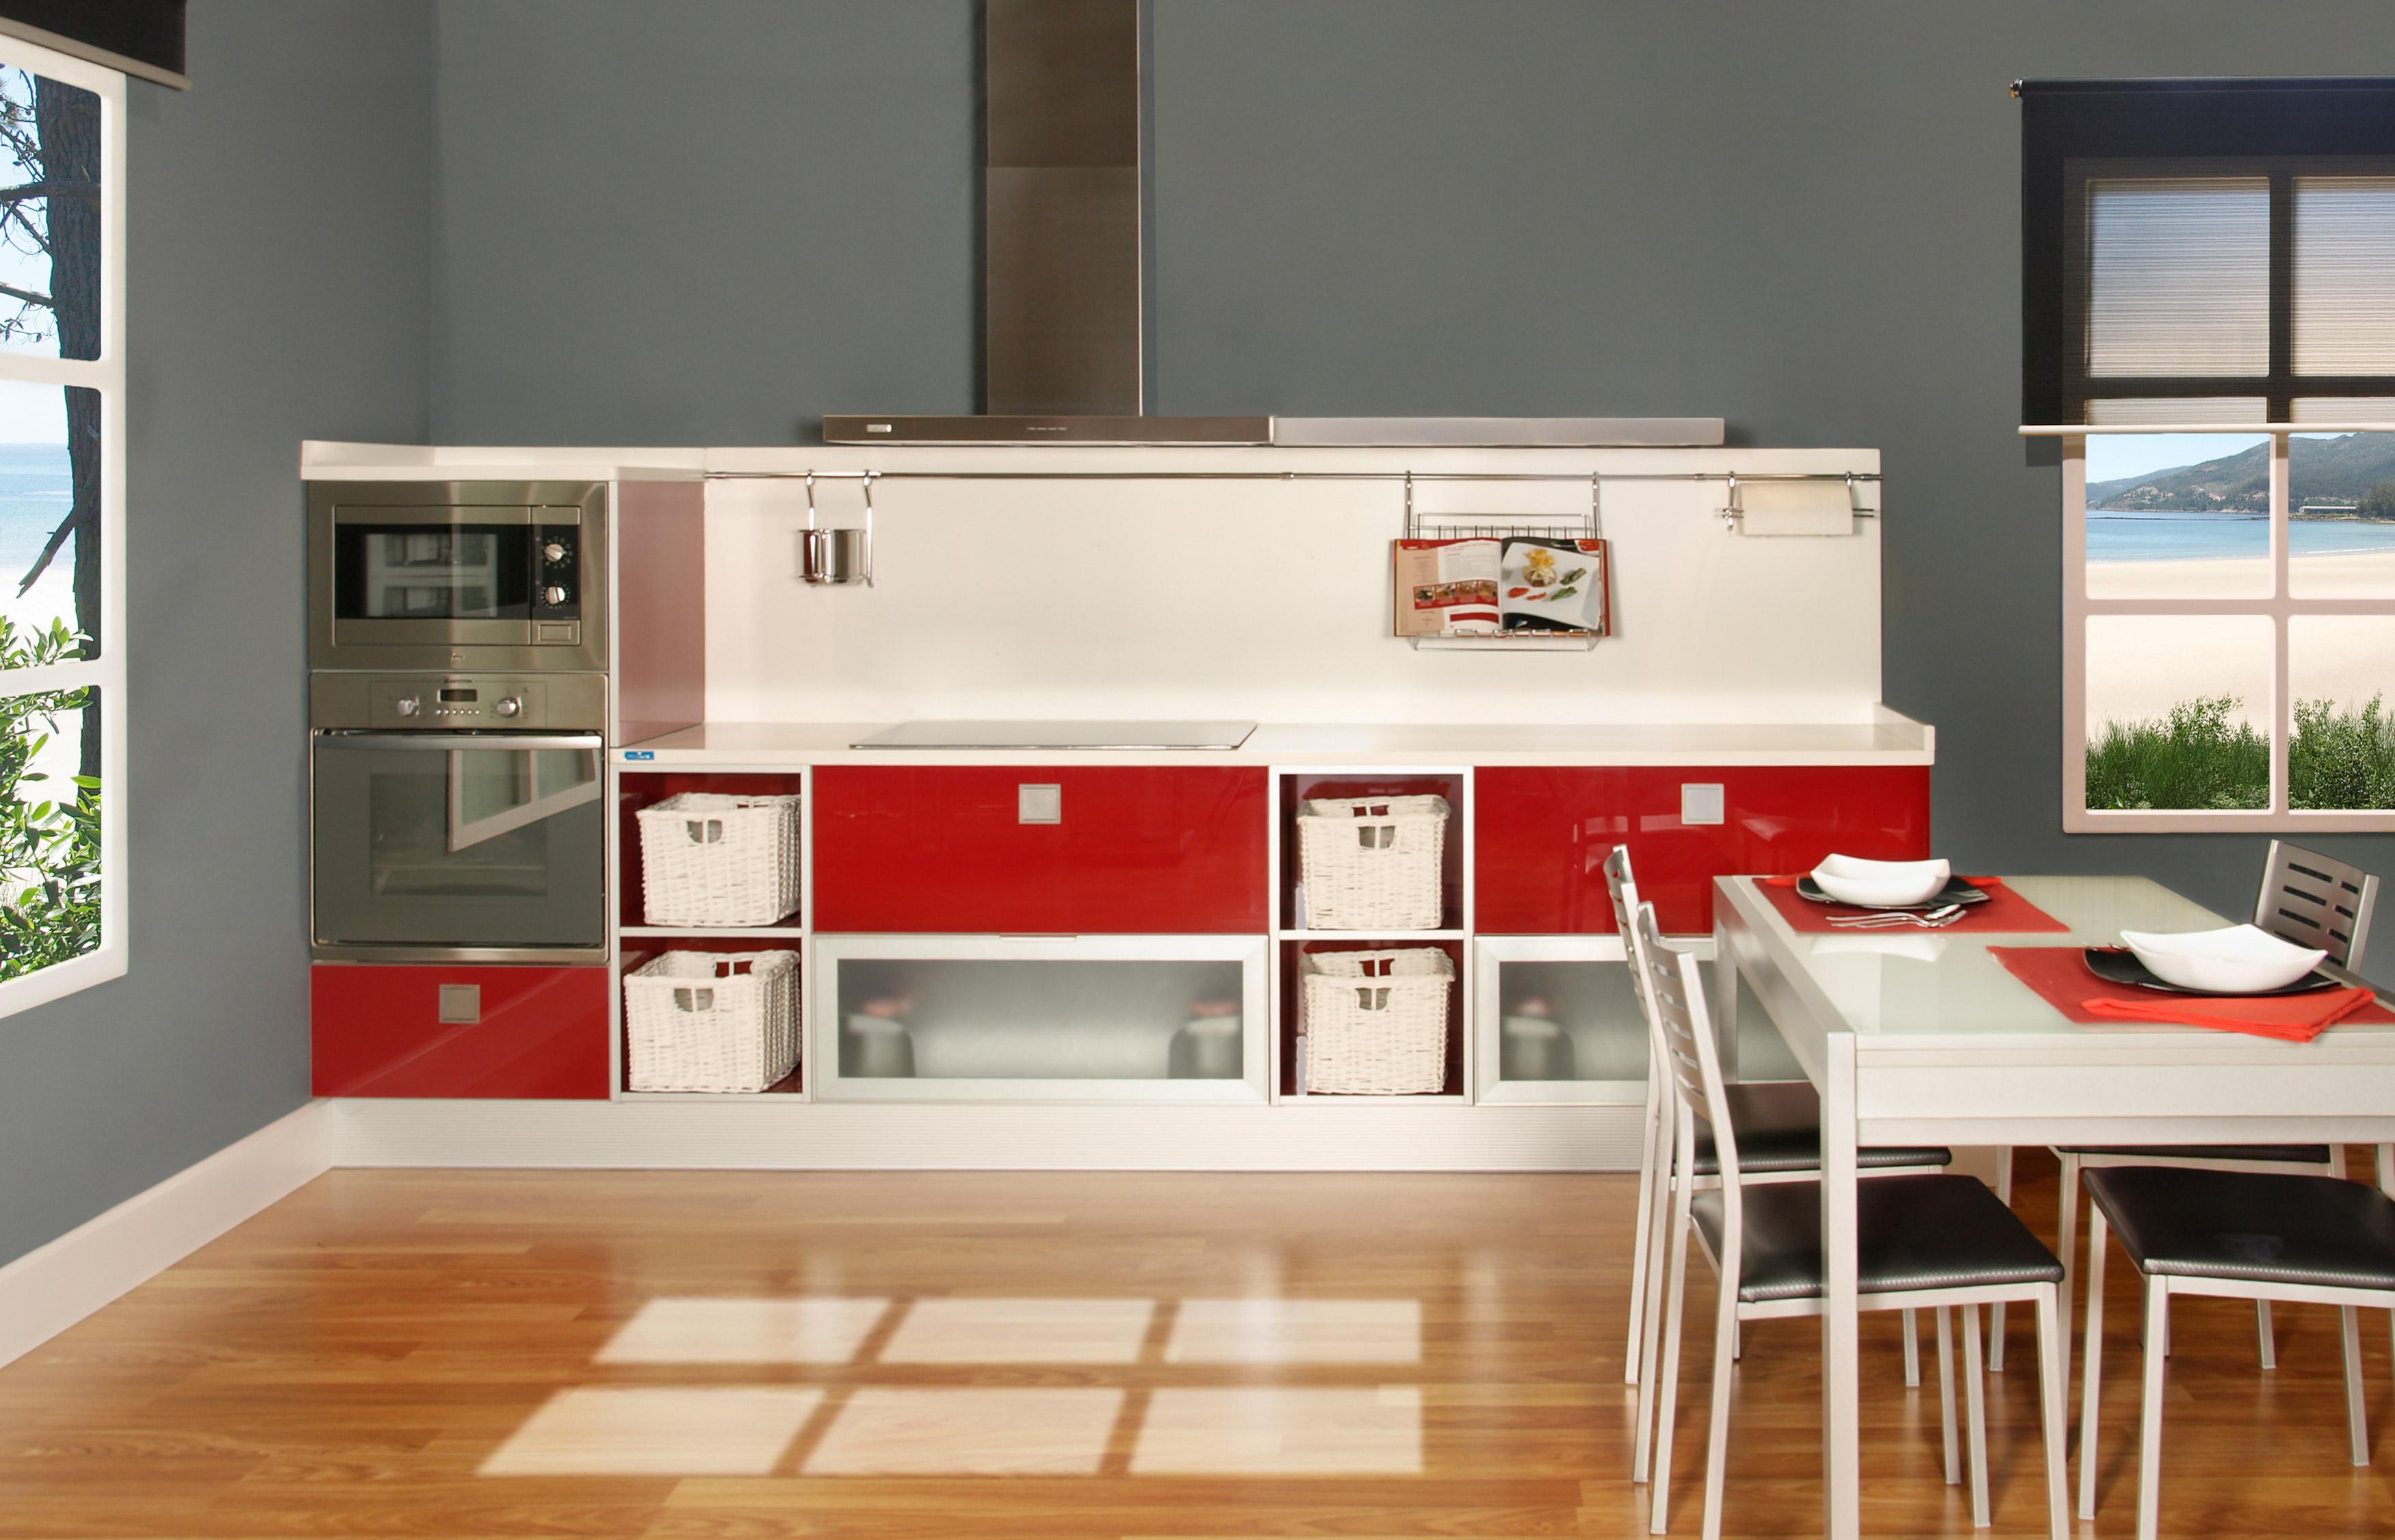 Modelo doce muebles de cocina hermanos p rez - Modelos muebles de cocina ...